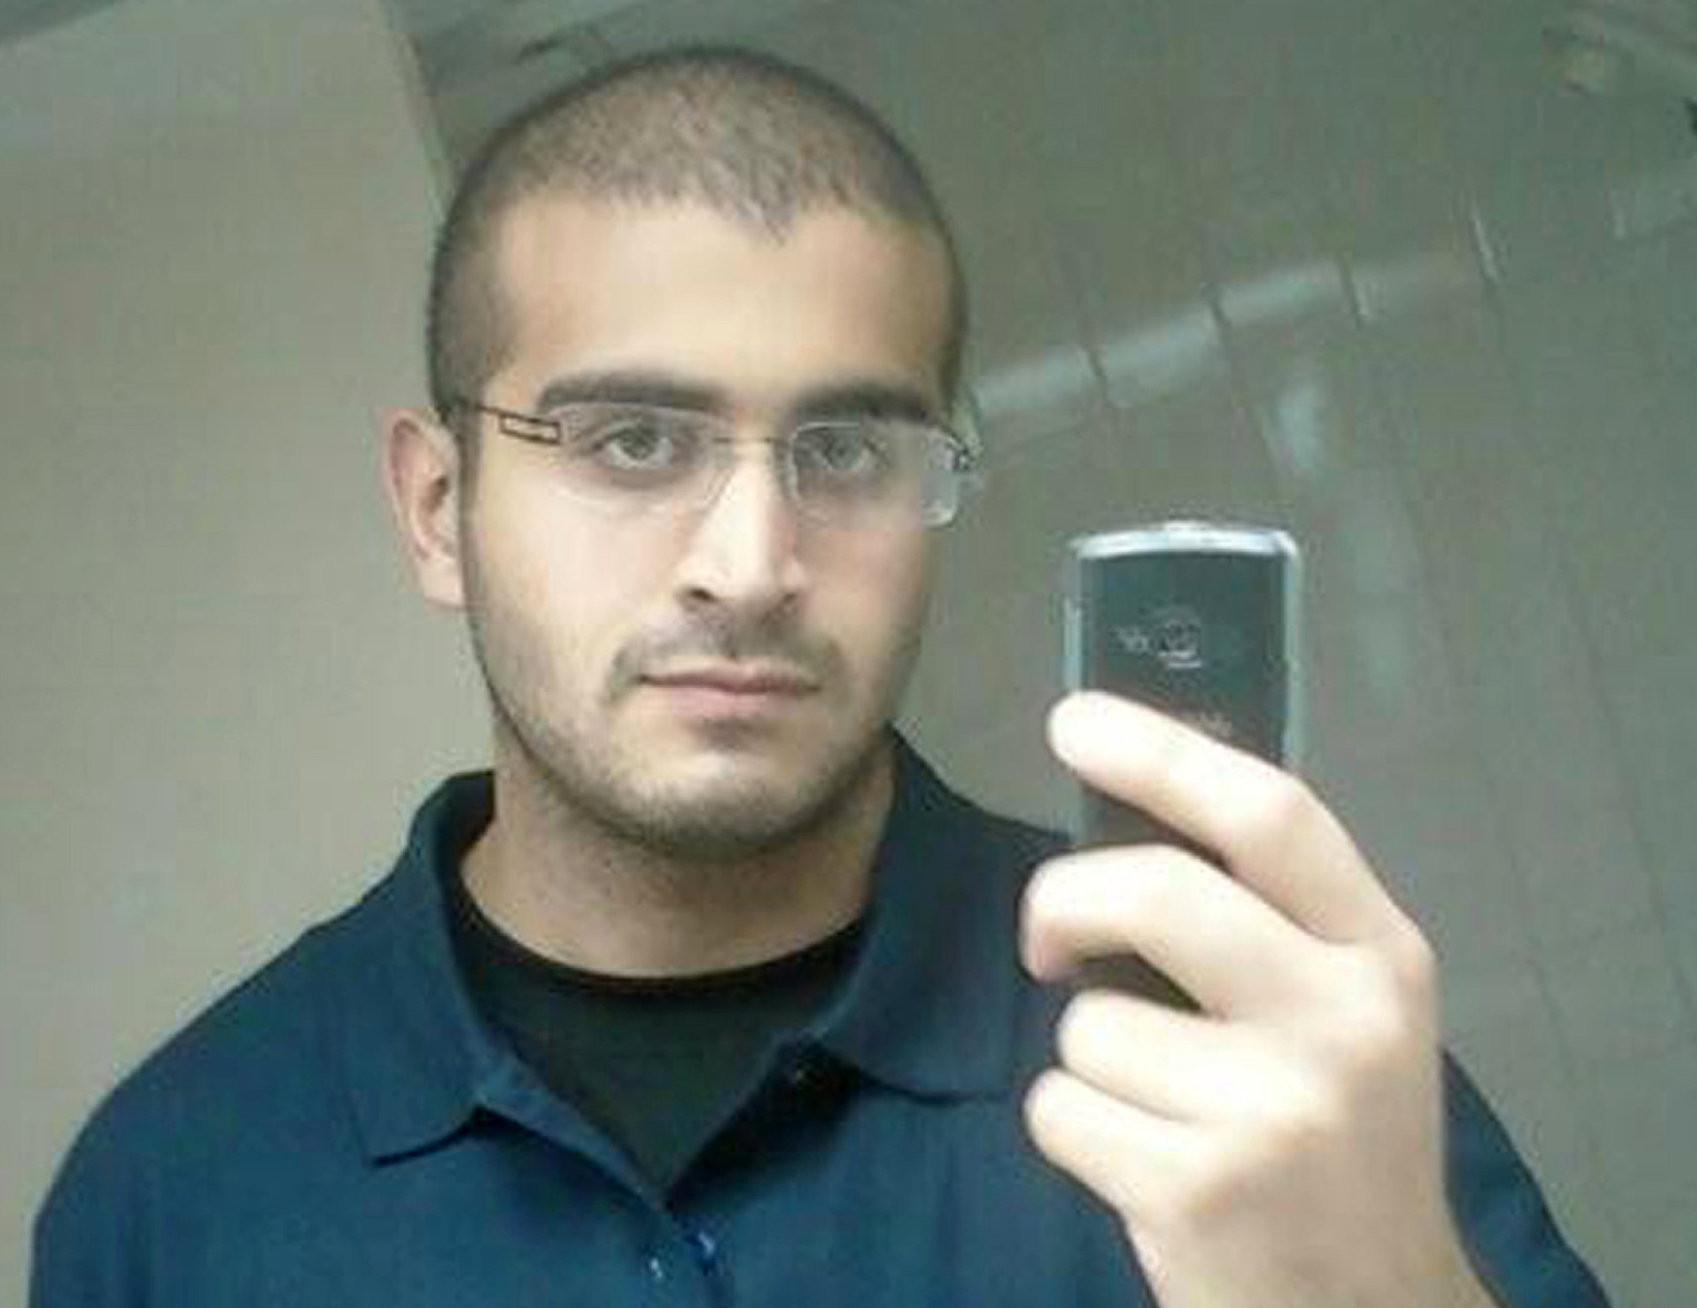 <p>Омар Матин. Фото: &copy;&nbsp;via Myspace/Handout via REUTERS</p>